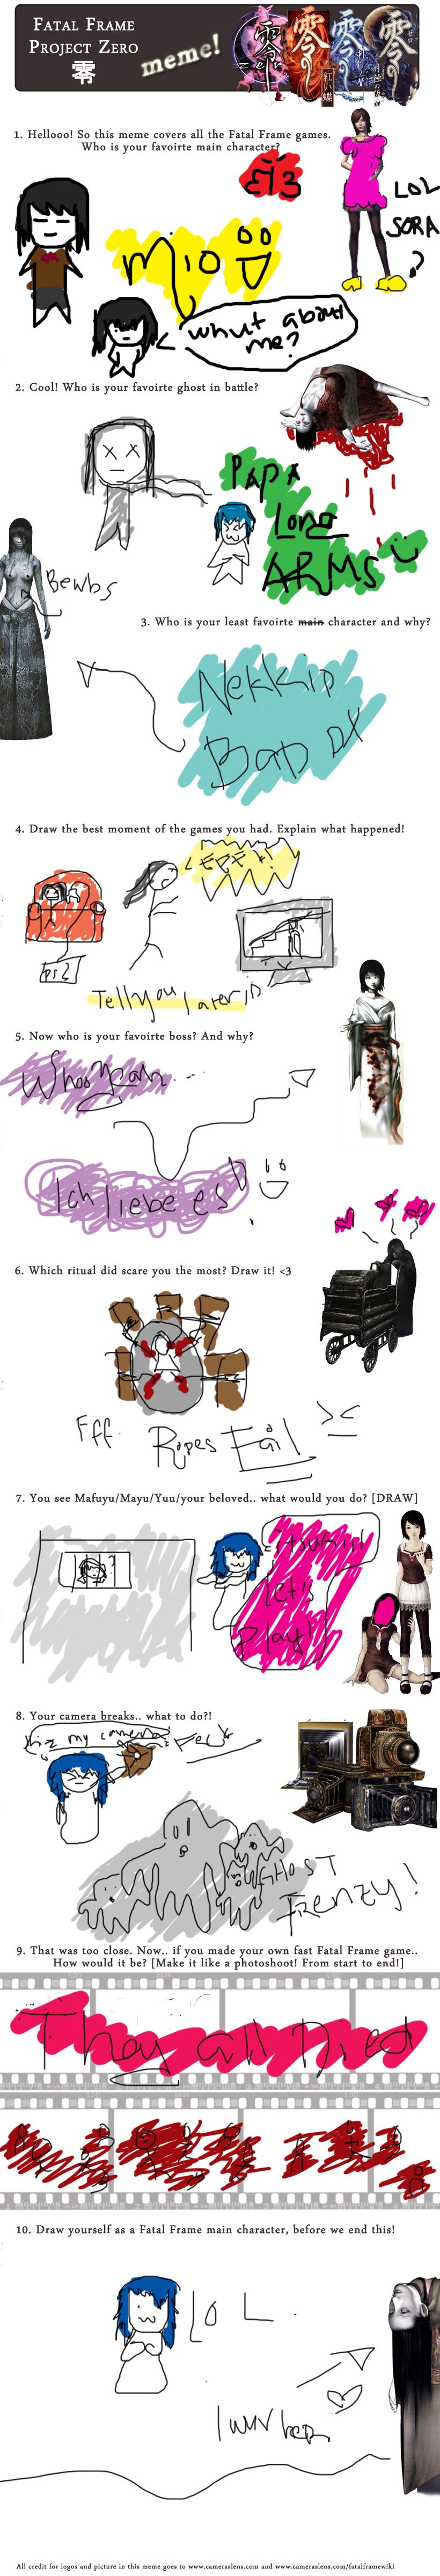 PZ or Fatal Frame meme by heartoflight23 on DeviantArt